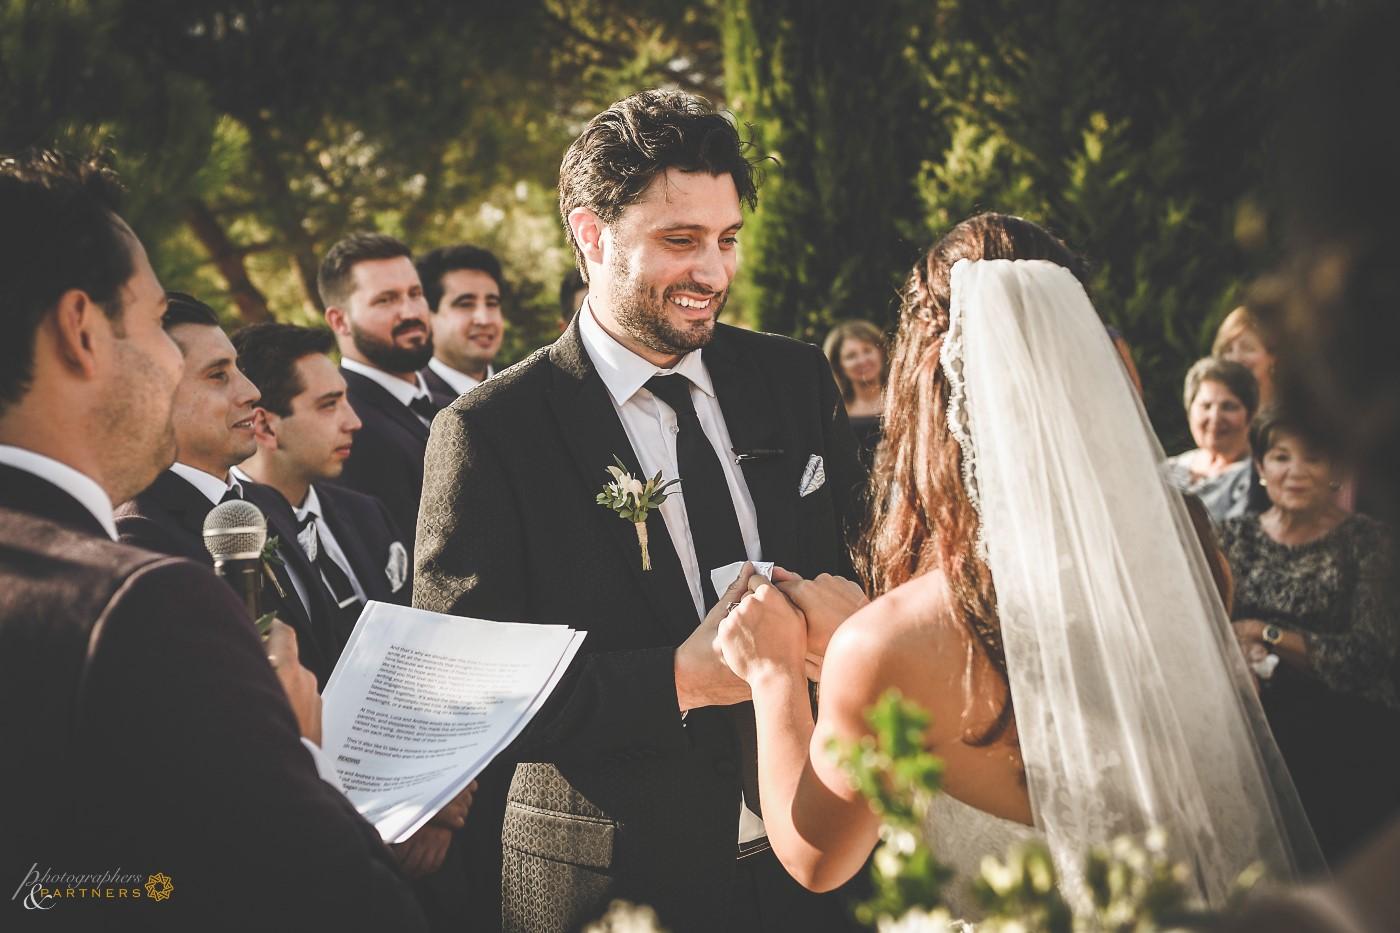 wedding_photographer_montepulciano_12.jpg